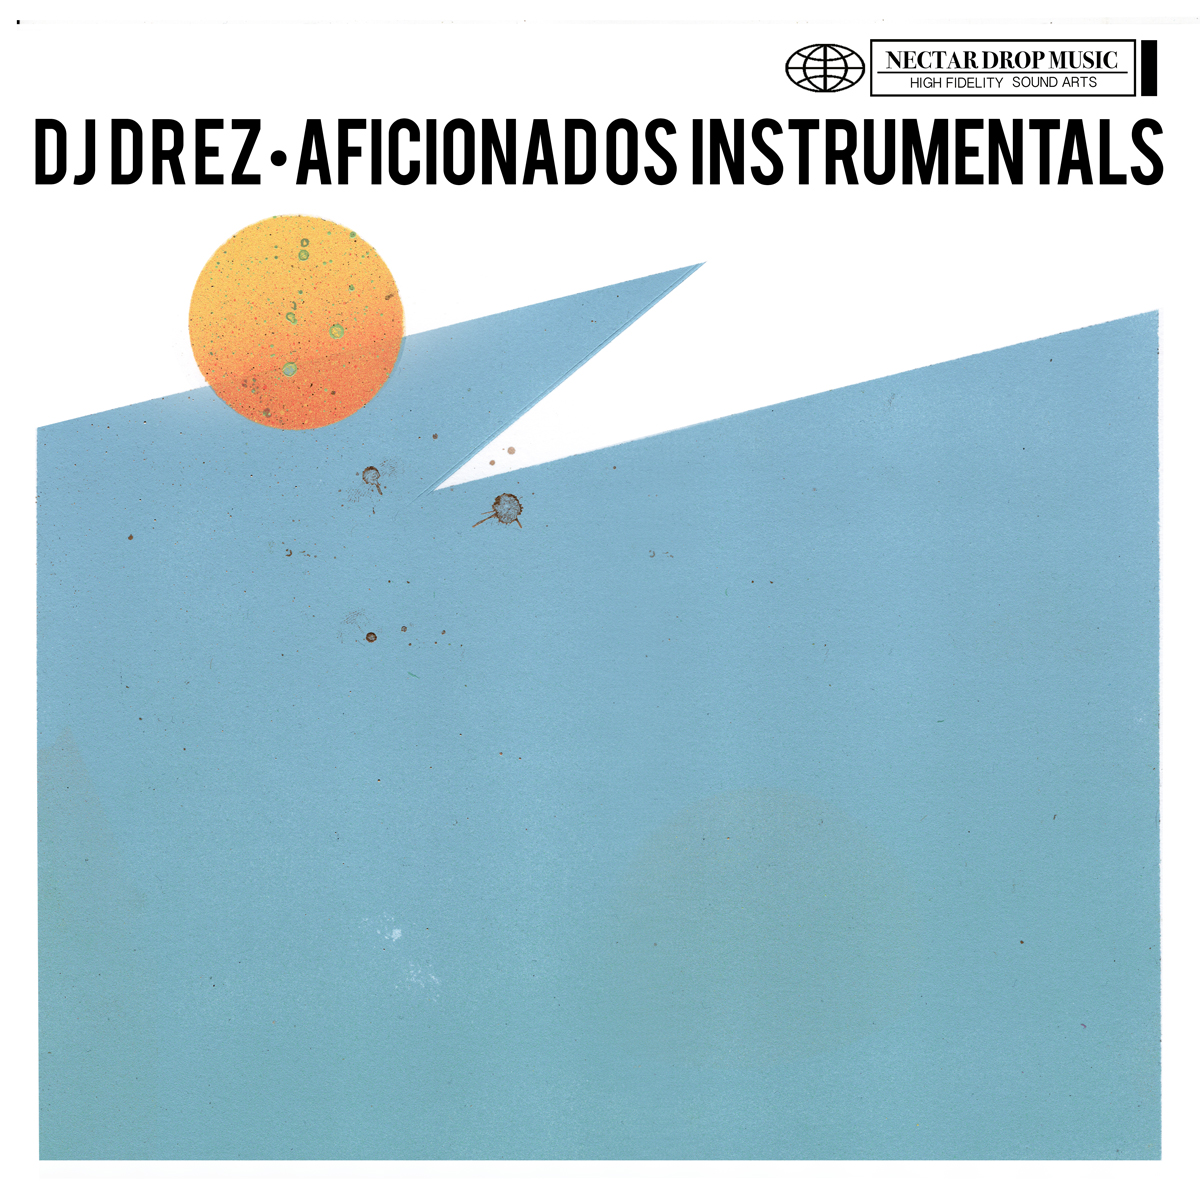 Aficionados Instrumentals DJ Drez